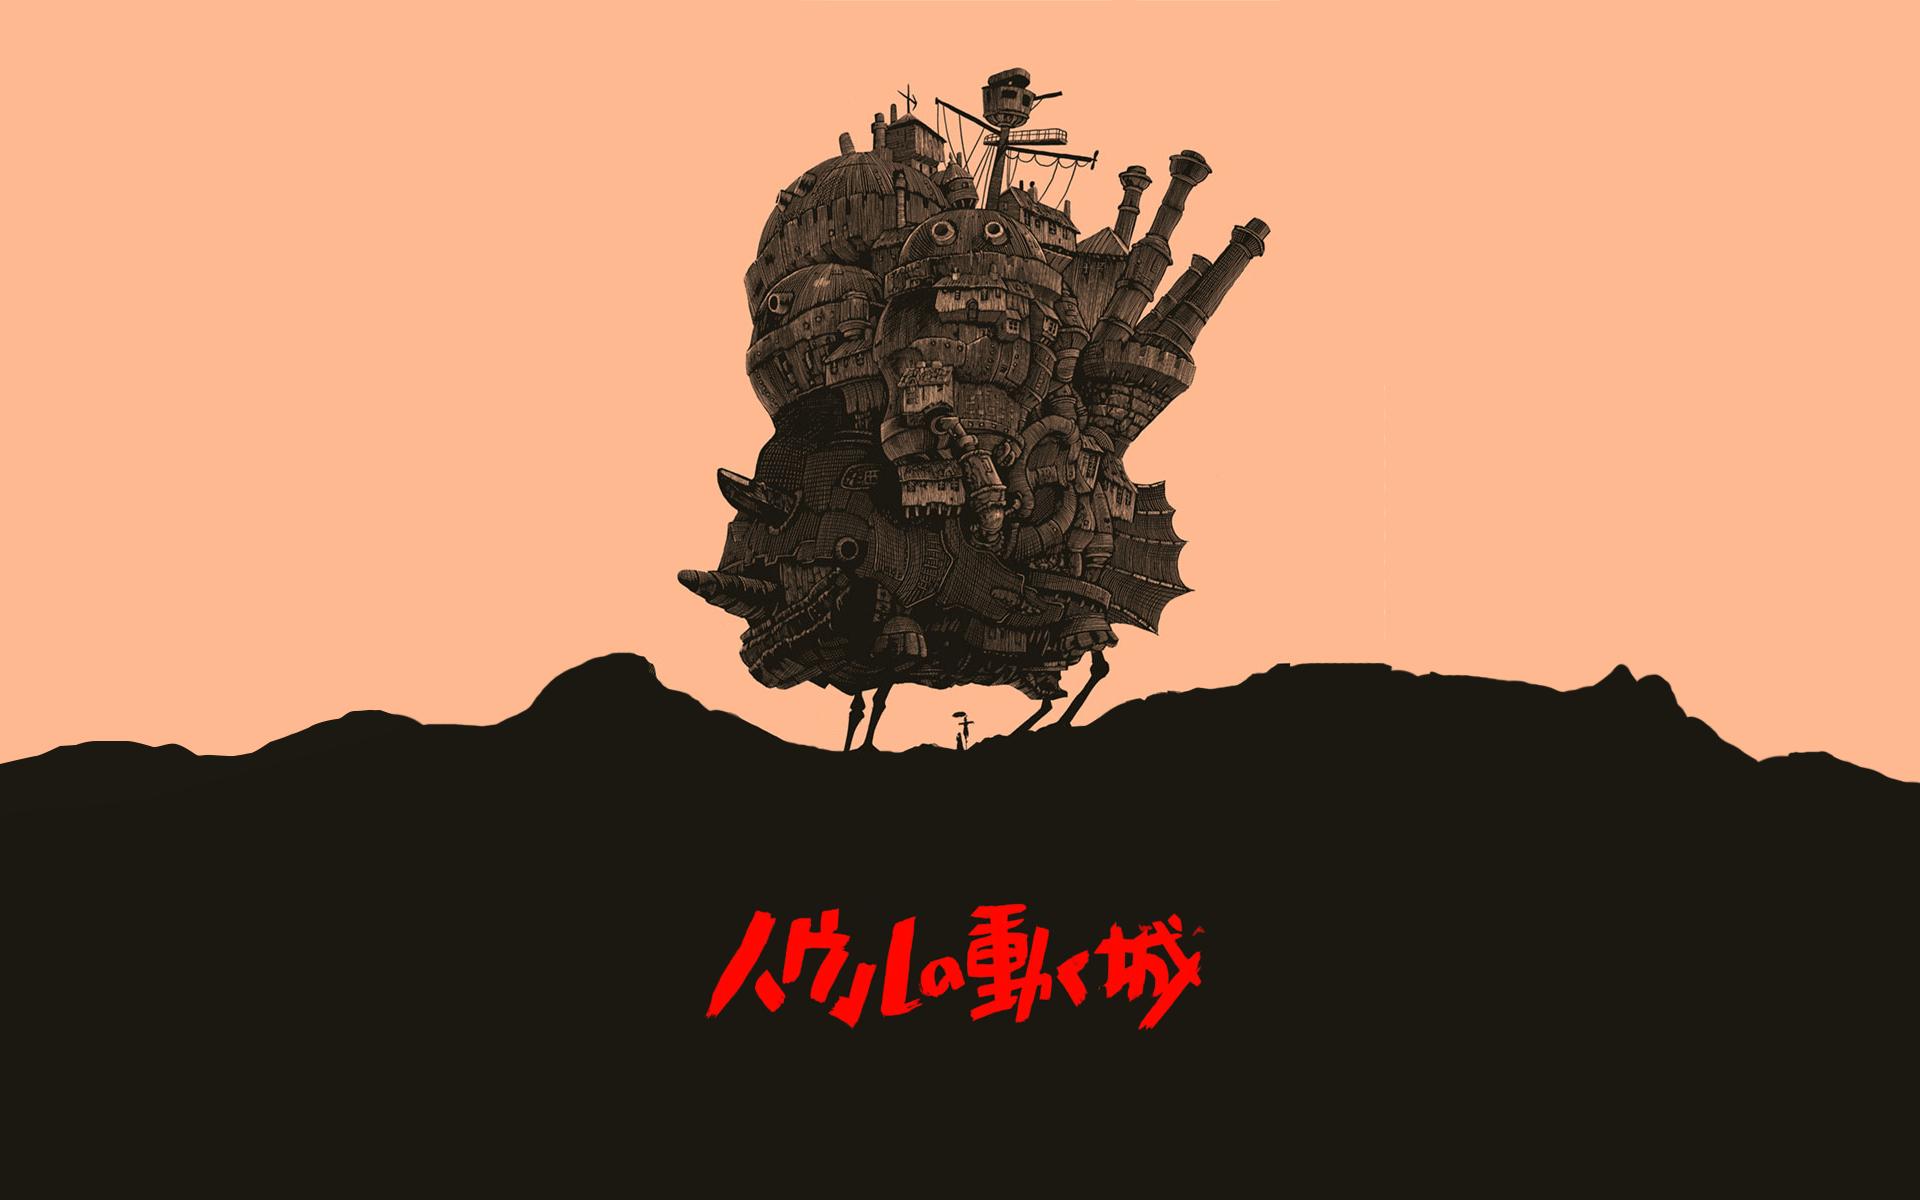 Howls Moving Castle Hd Wallpaper Wallpaper Olly Moss Studio Ghibli Hayao Miyazaki Howl